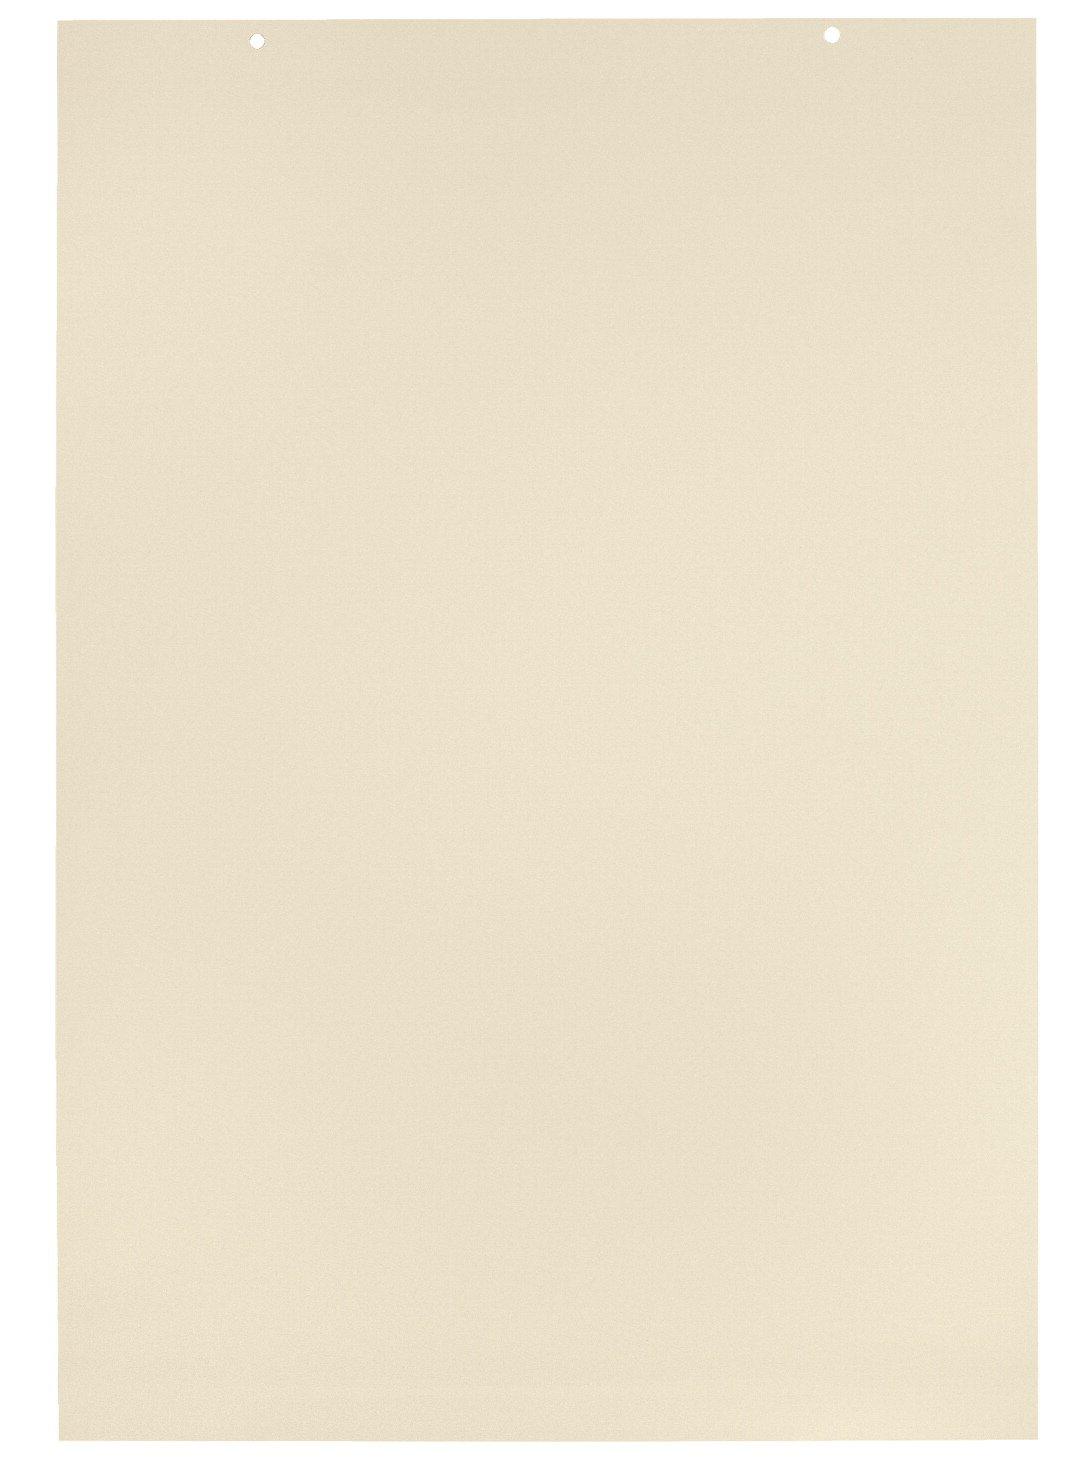 School Smart Tag Chart Paper - 2 feet x 3 feet - 1 inch Rule - Pack of 36 Sheets - Manila